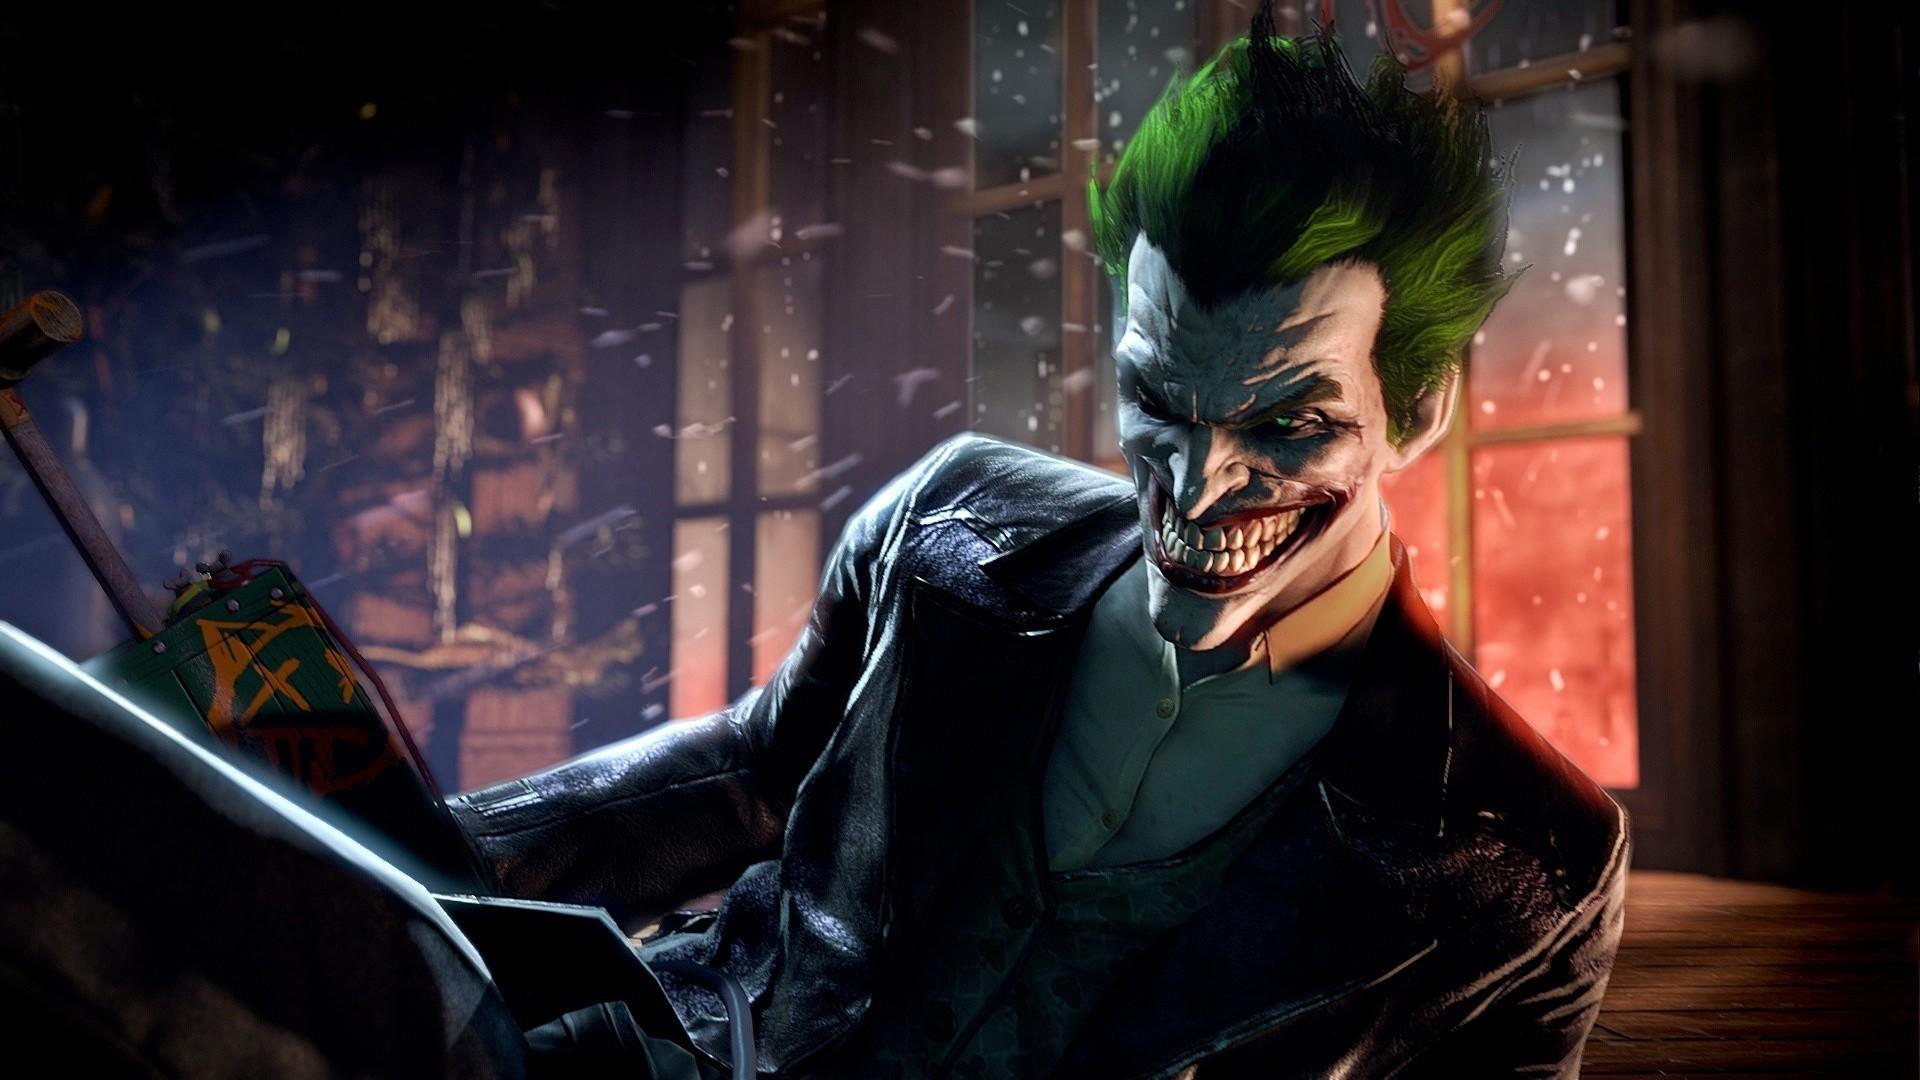 Cool Wallpaper Halloween Joker - mLJPd5  Best Photo Reference_401646.jpg